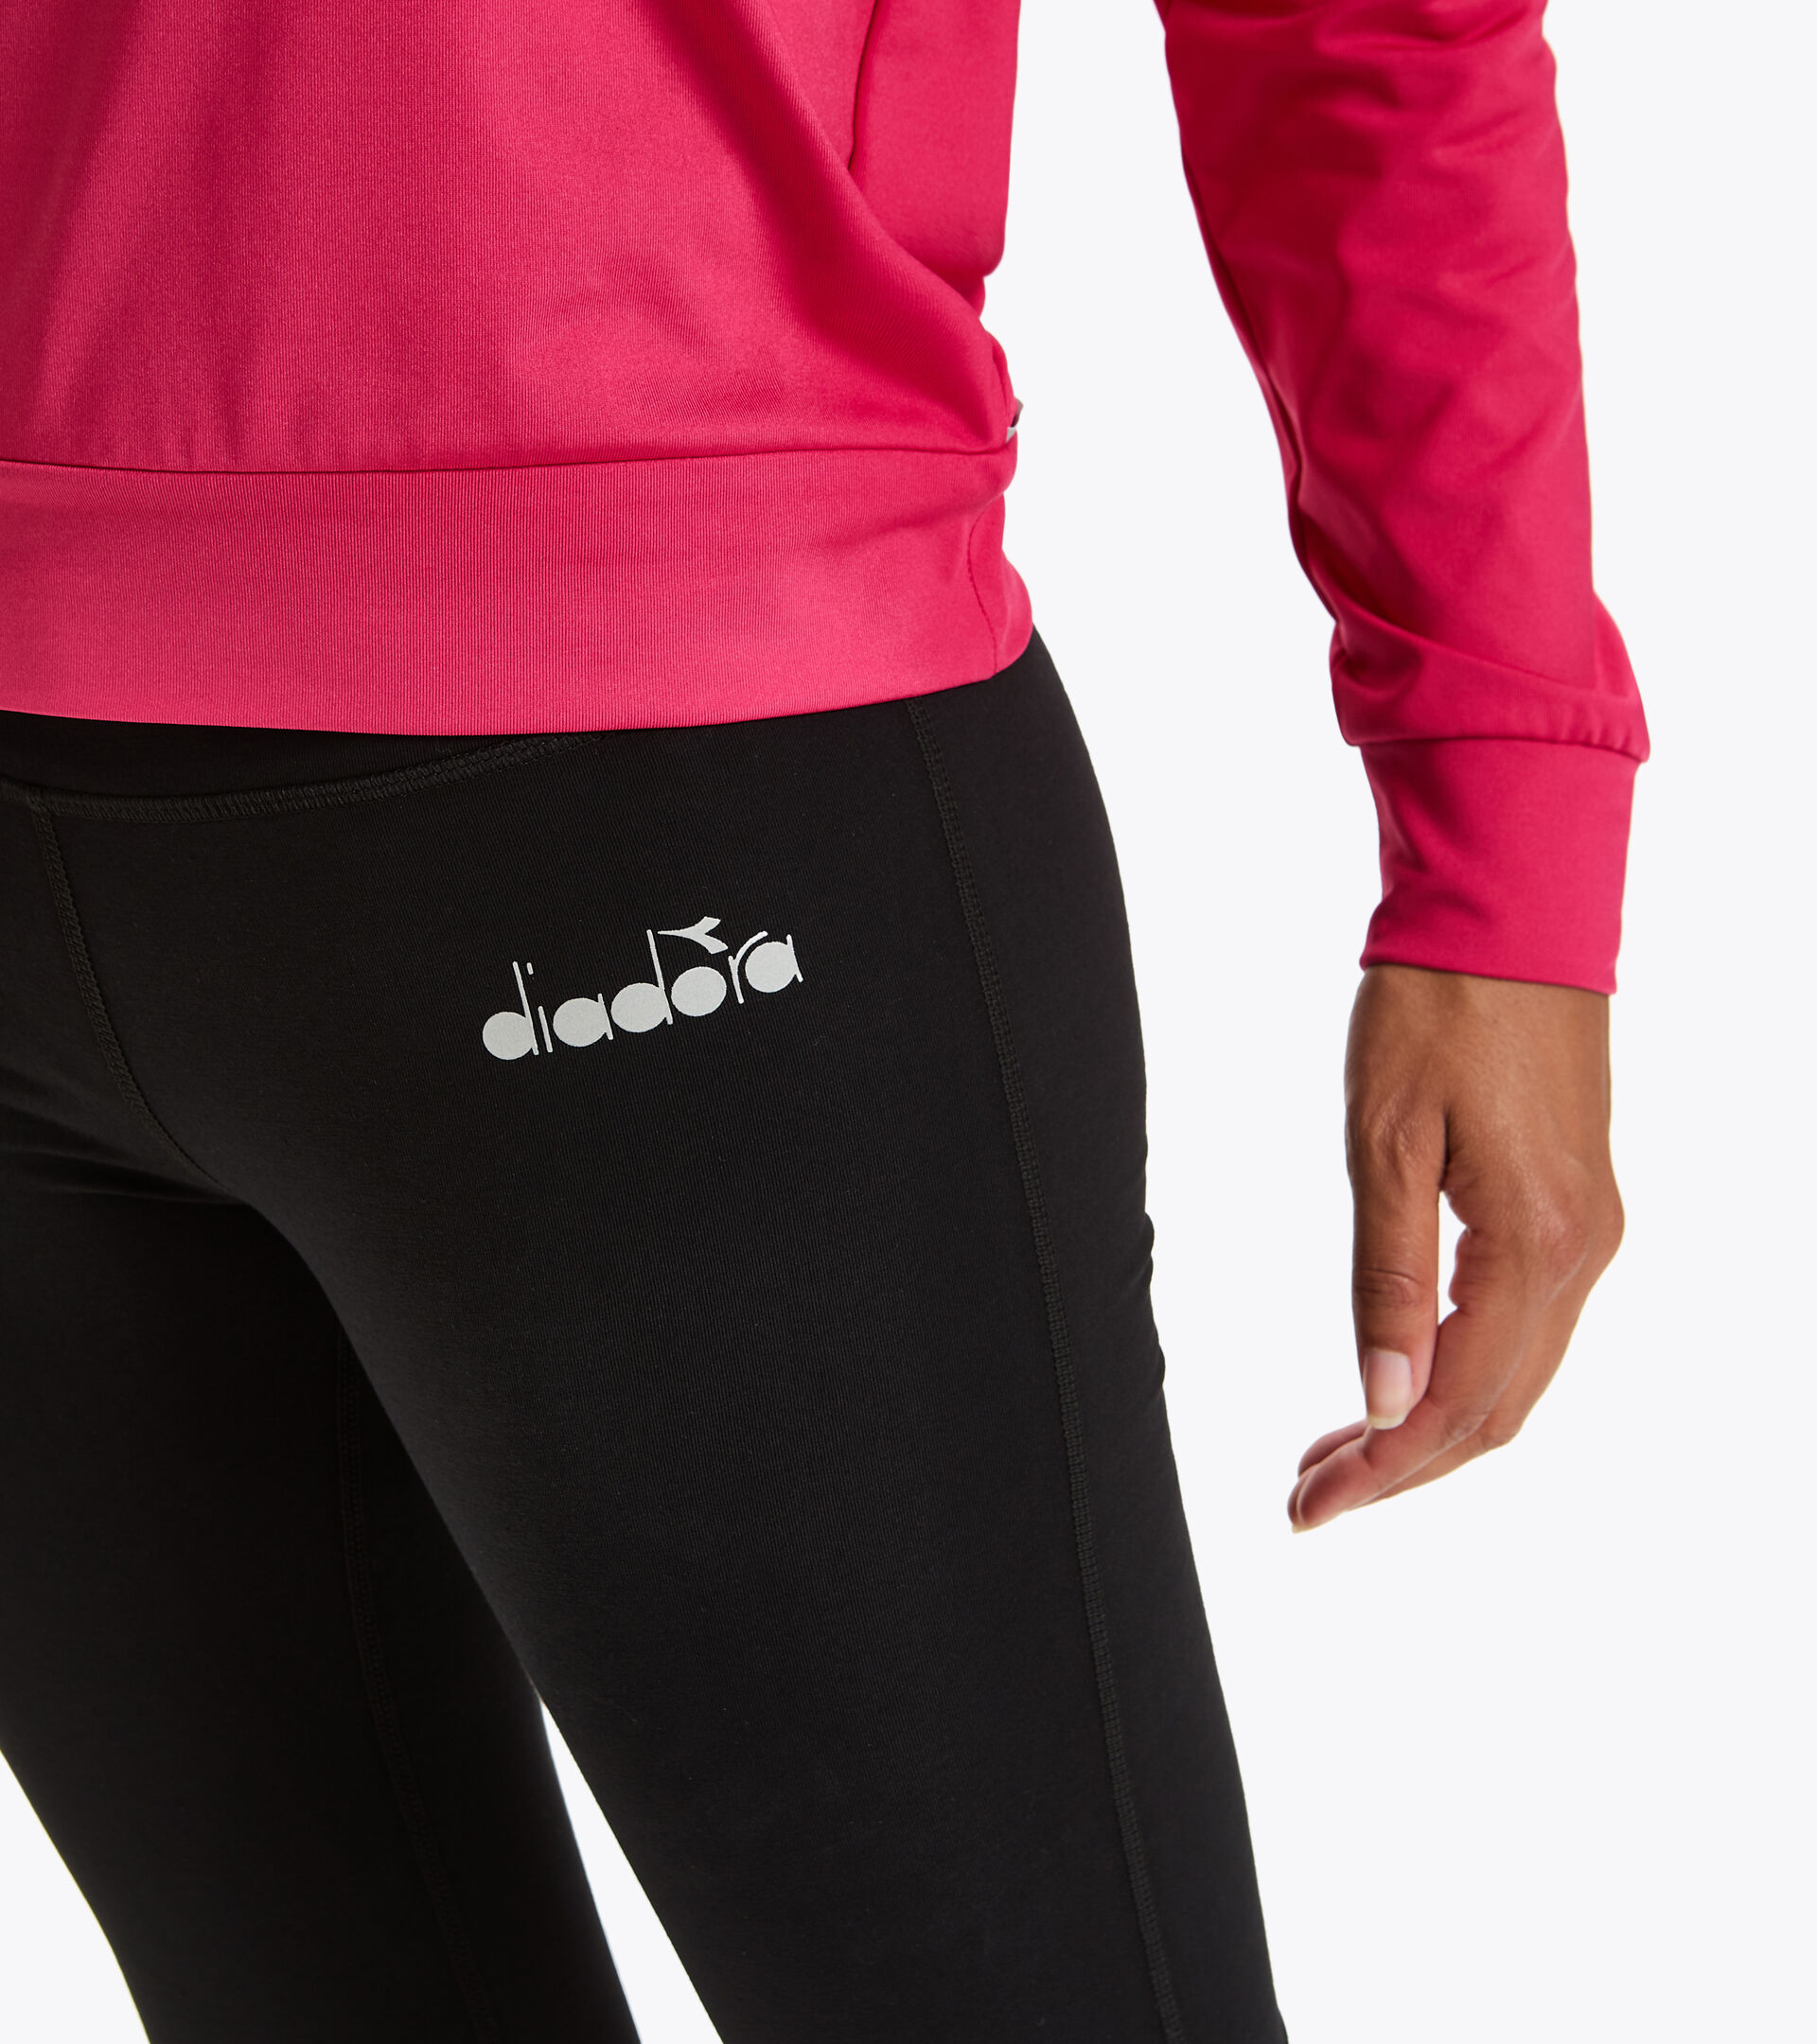 Training leggings - Women L. 3/4 TIGHTS BE ONE BLACK - Diadora